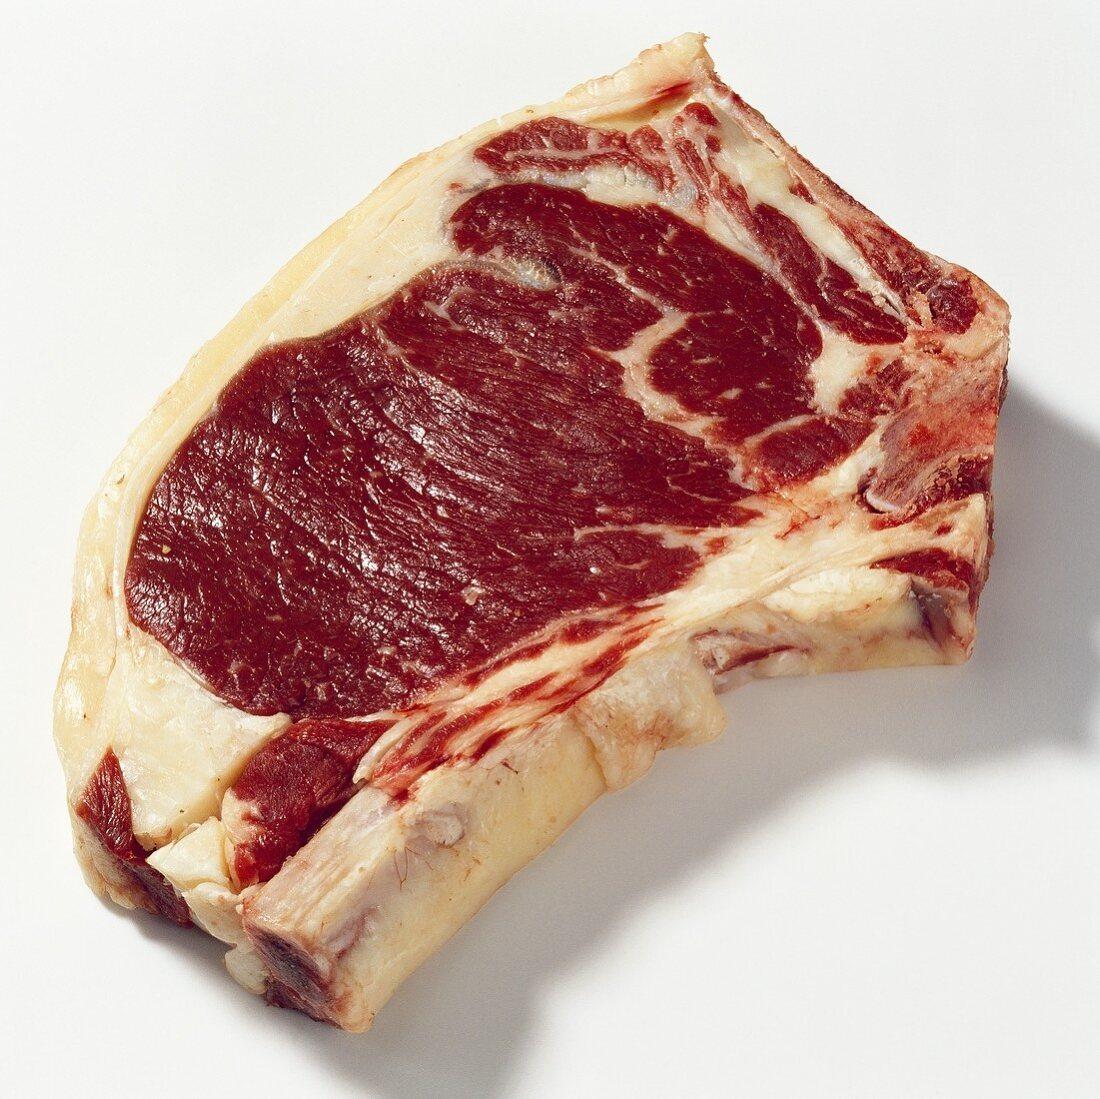 Slice of beef sirloin with bone